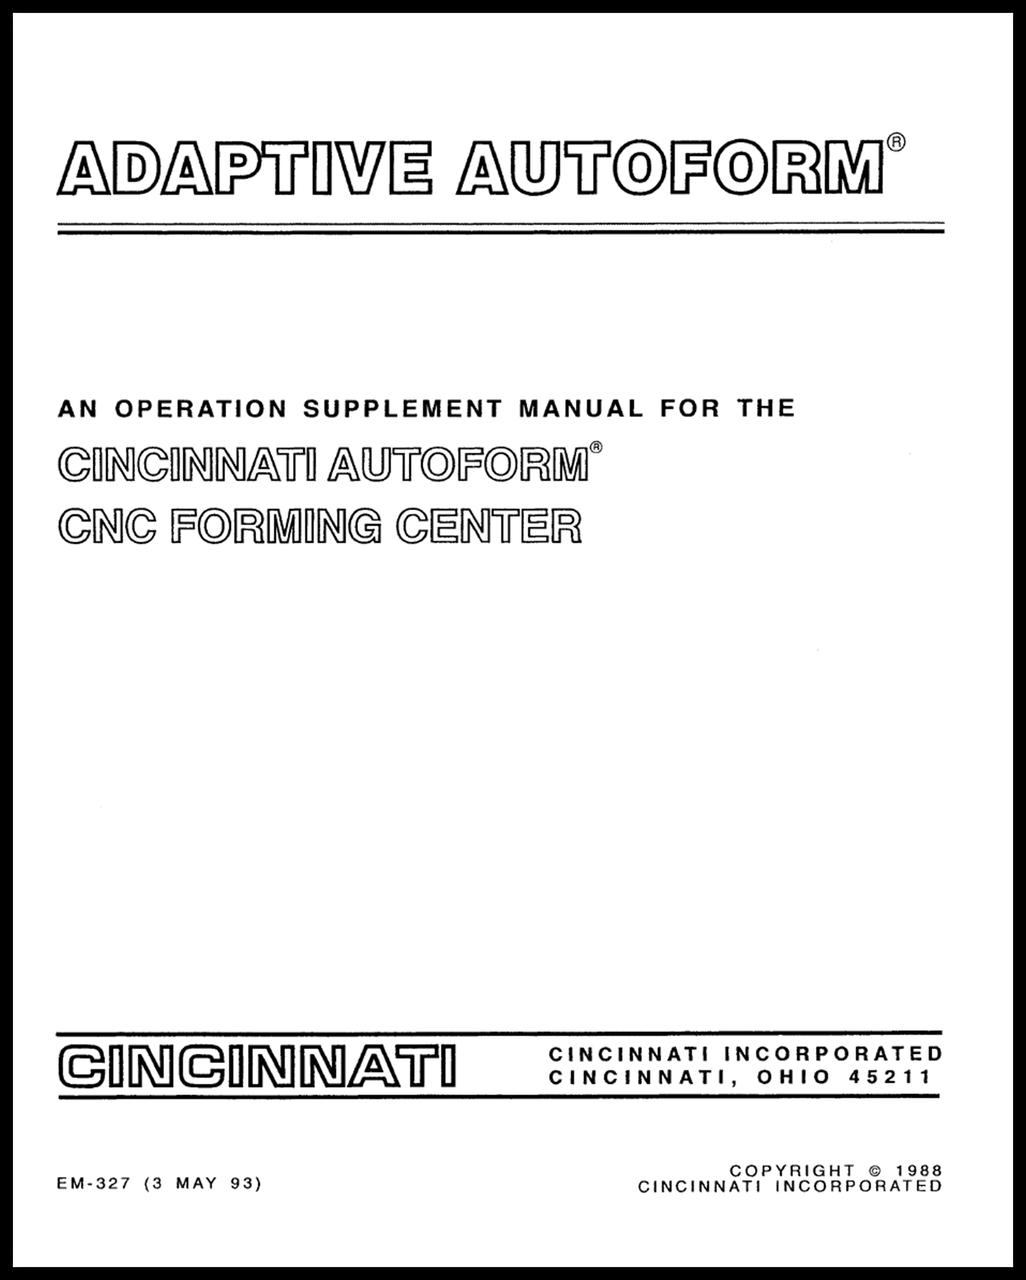 EM-327 (3 MAY 93) Adaptive AUTOFORM, An Operation Supplement Manual for the CINCINNATI AUTOFORM CNC Forming Center